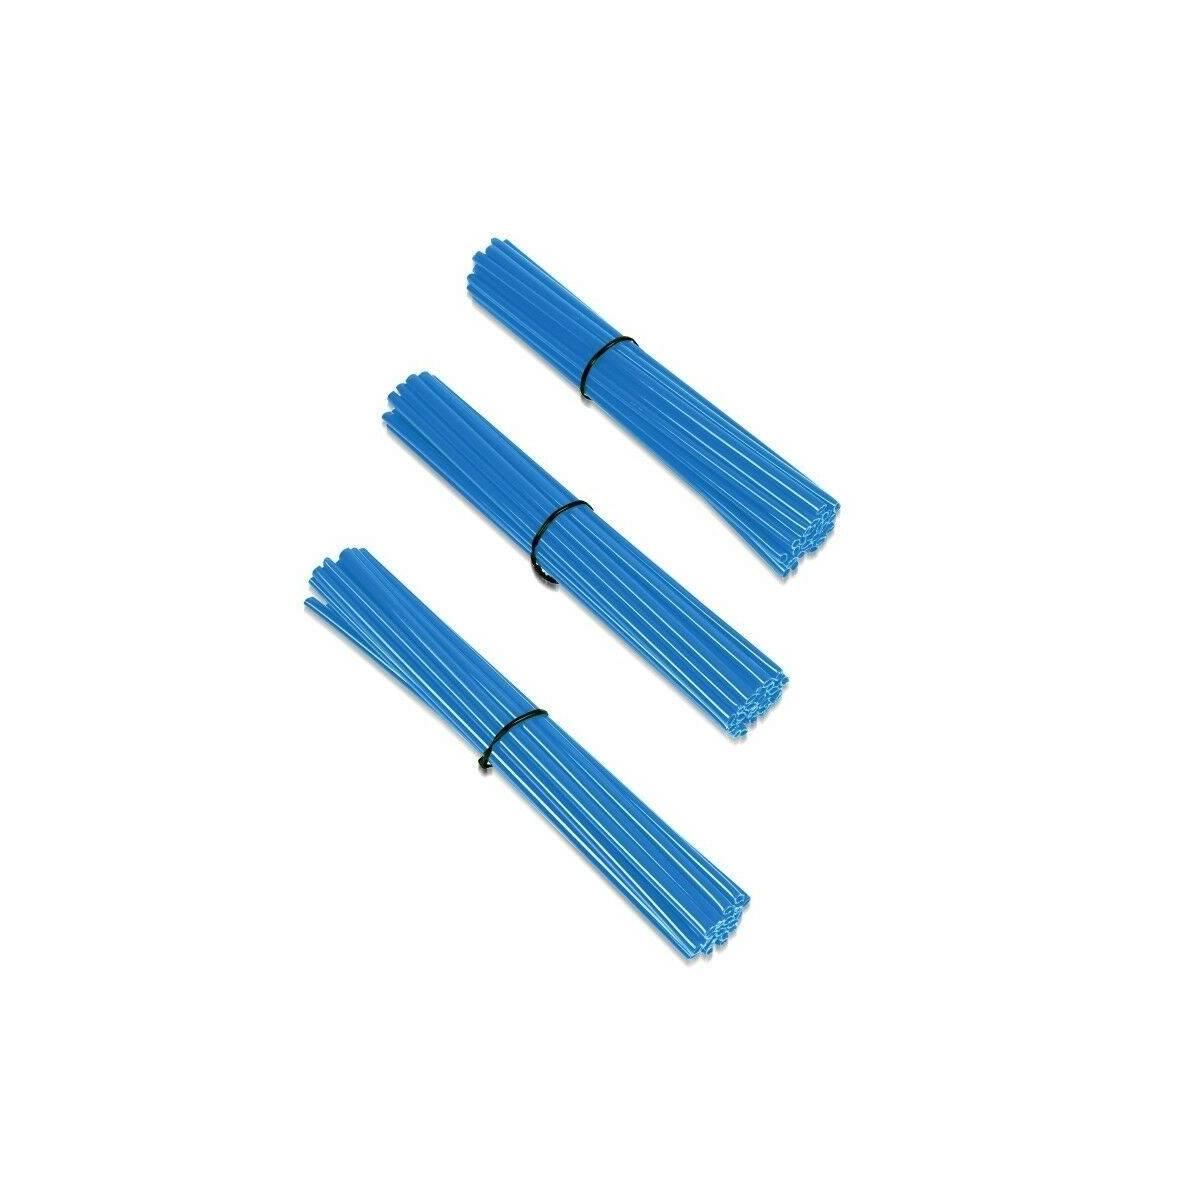 83379-AZ - Cubre Radios Azul